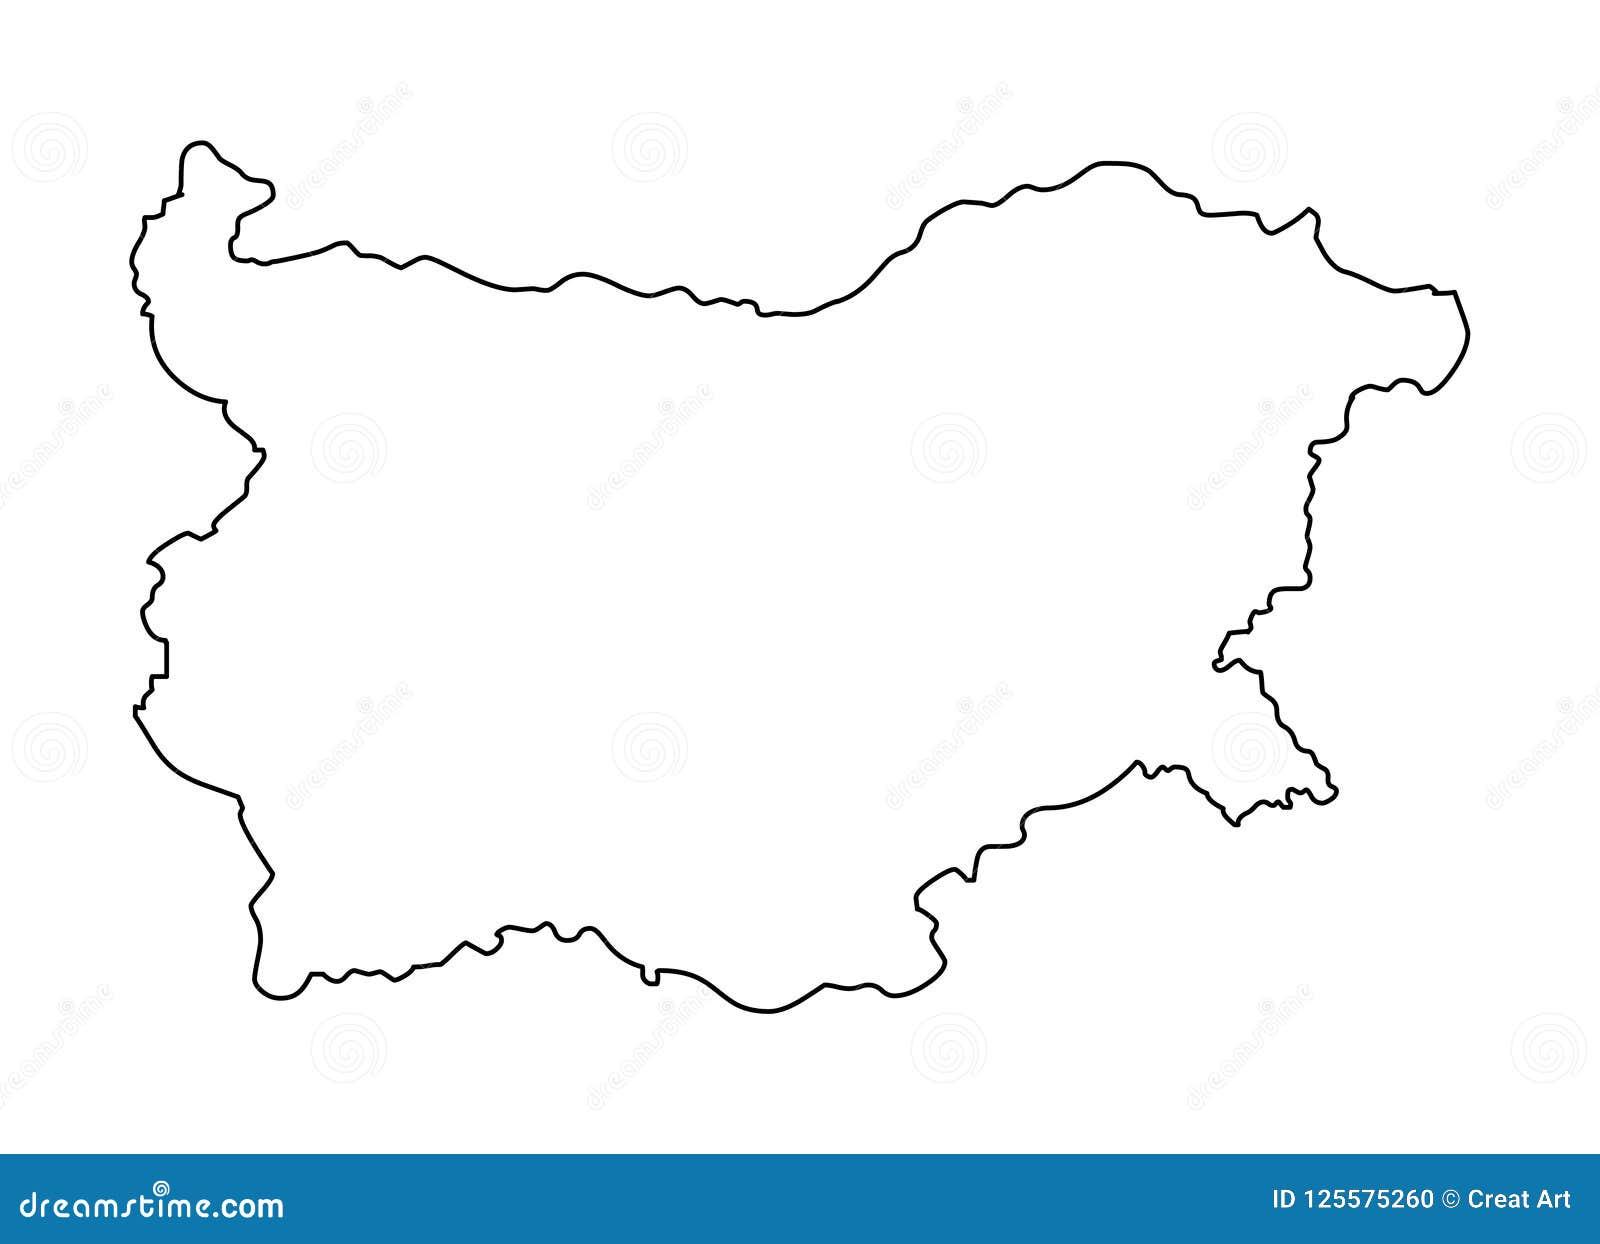 Bułgaria konturu mapy wektoru ilustracja